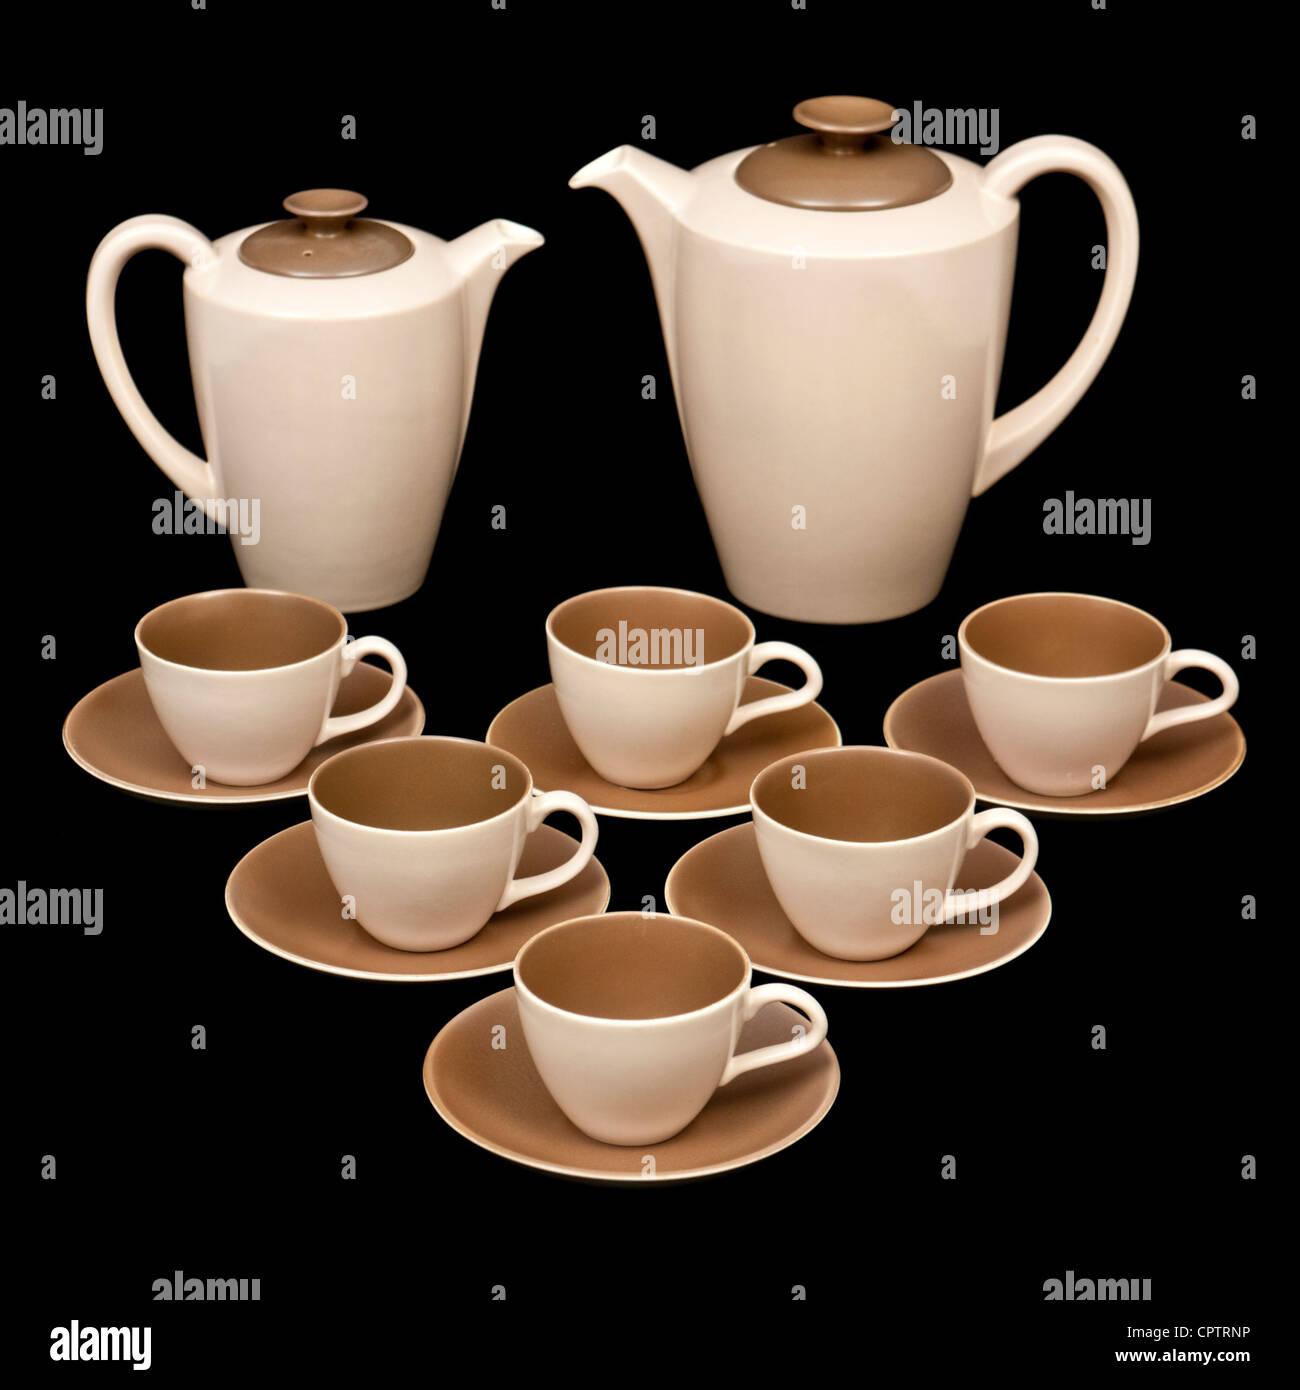 Mid-1950u0027s Poole Pottery C54 Streamline Twin-Tone (Mushroom u0026 Sepia) coffee / tea service designed by Alfred Read. & Mid-1950u0027s Poole Pottery C54 Streamline Twin-Tone (Mushroom u0026 Sepia ...